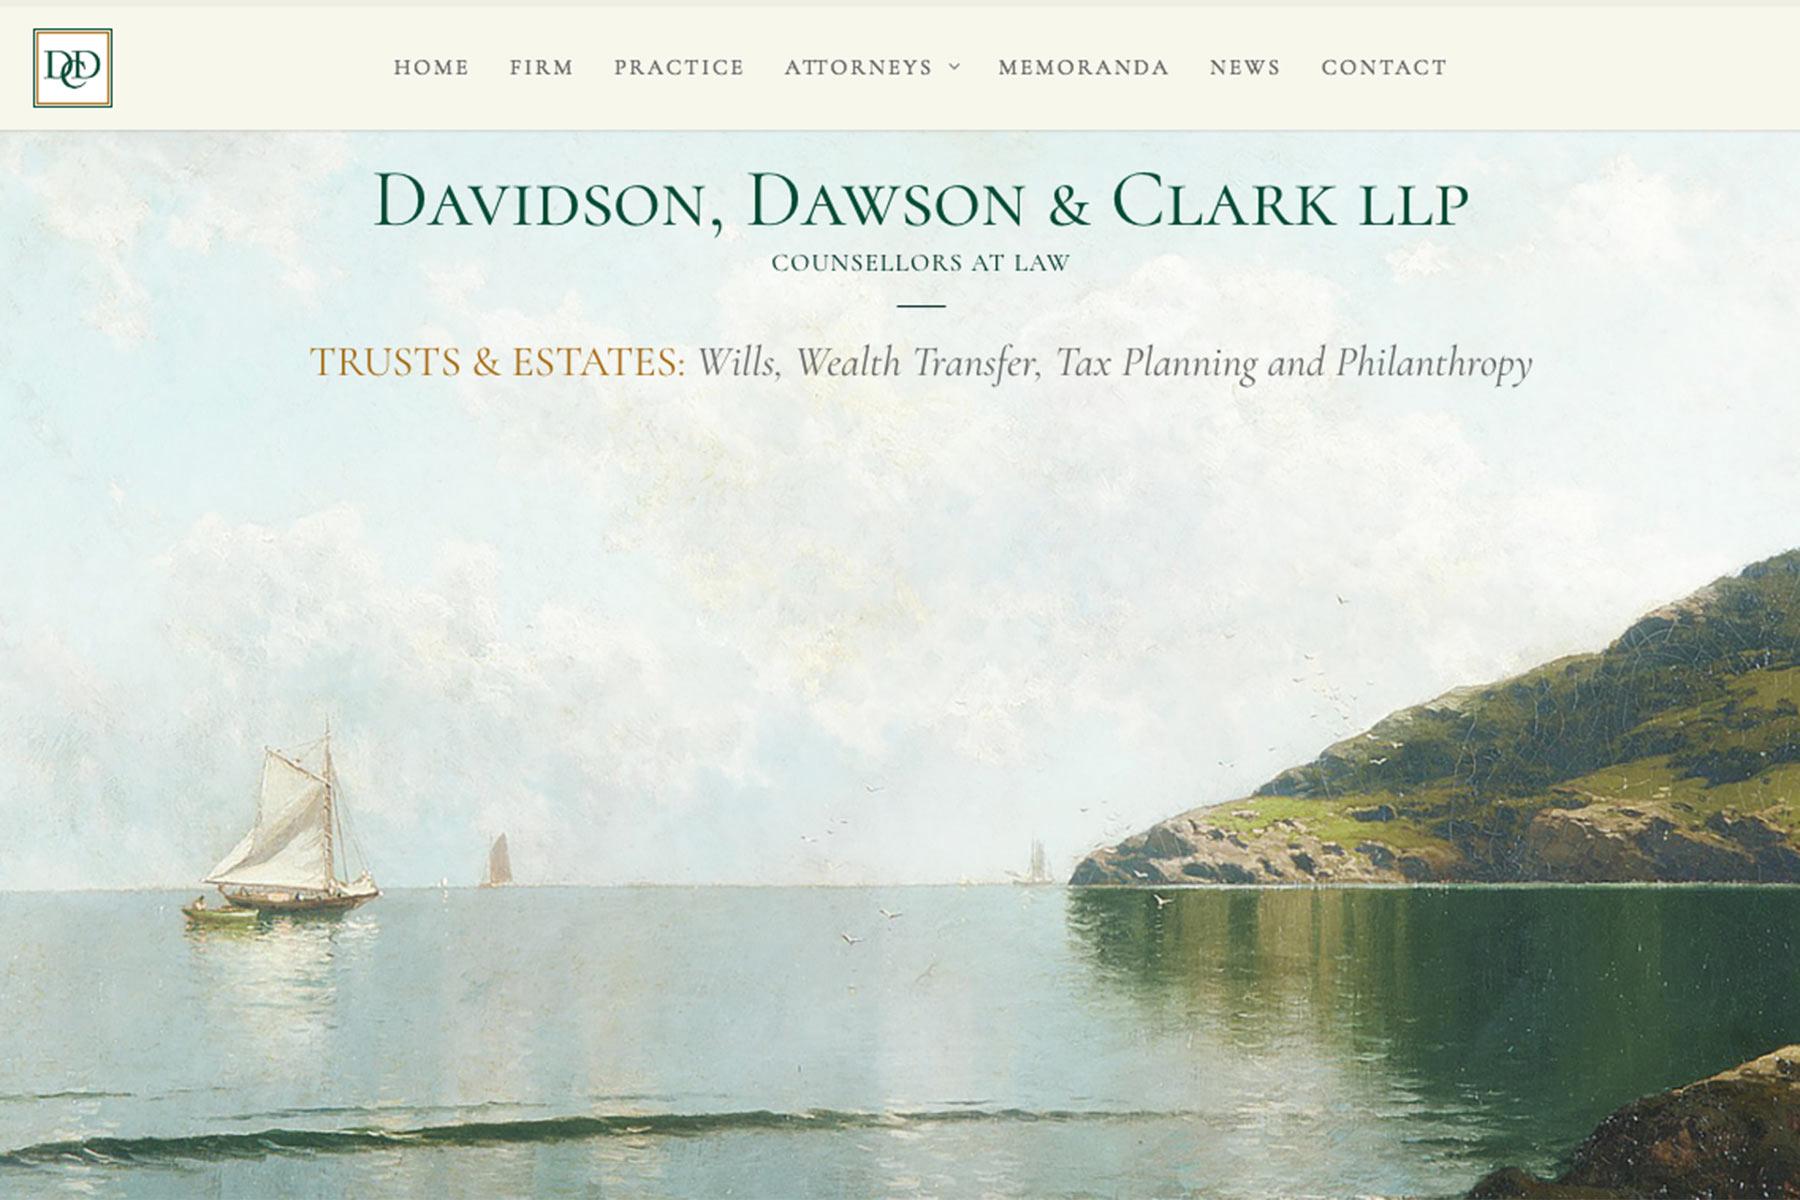 davidson-dawson-site